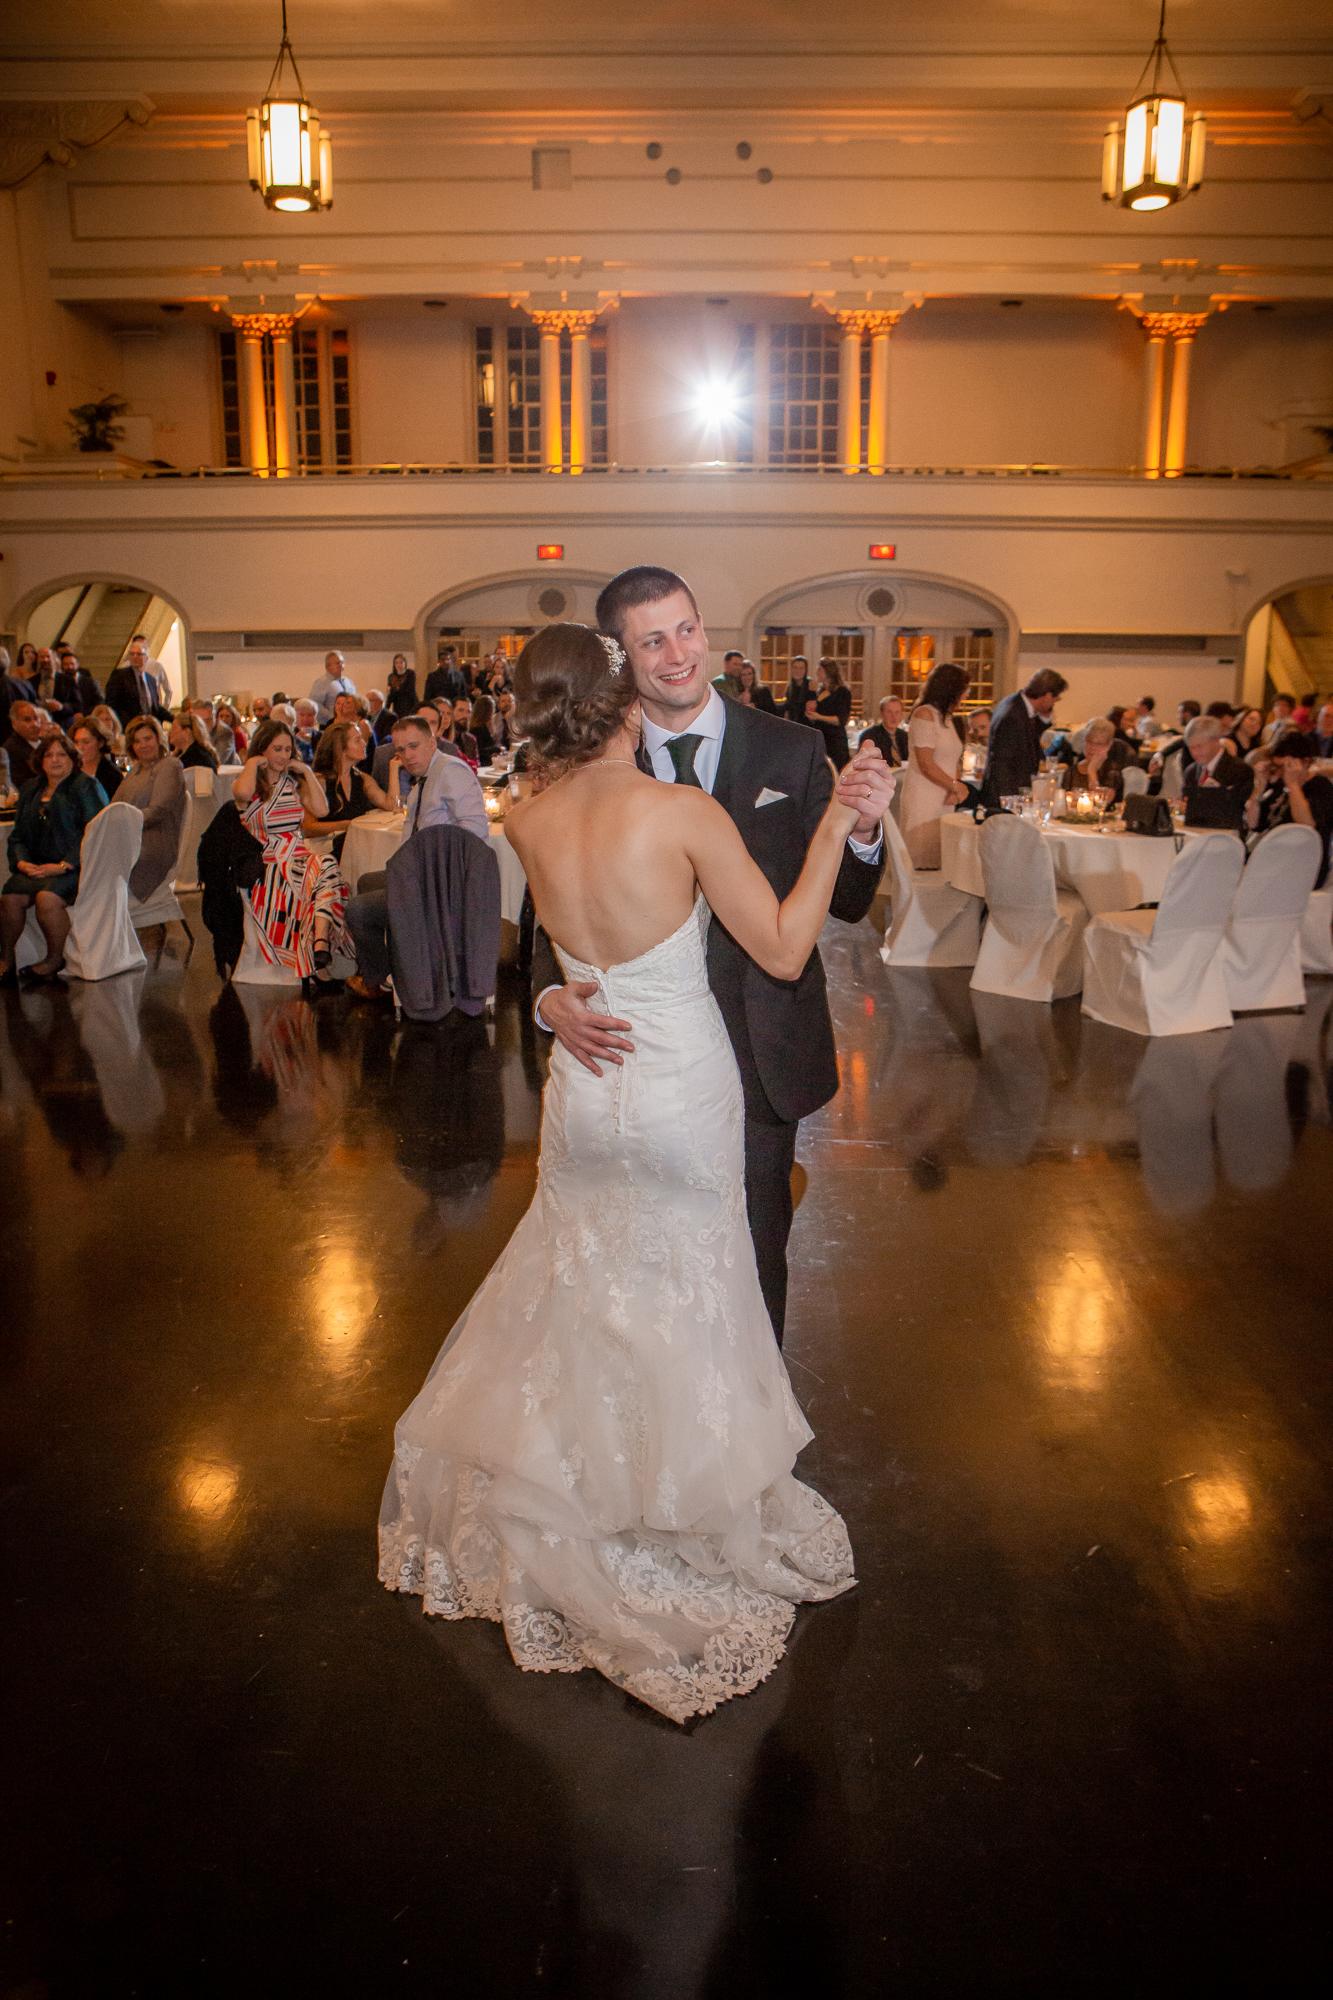 Harro-East-Theatre-and-Ballroom-wedding-8107.jpg